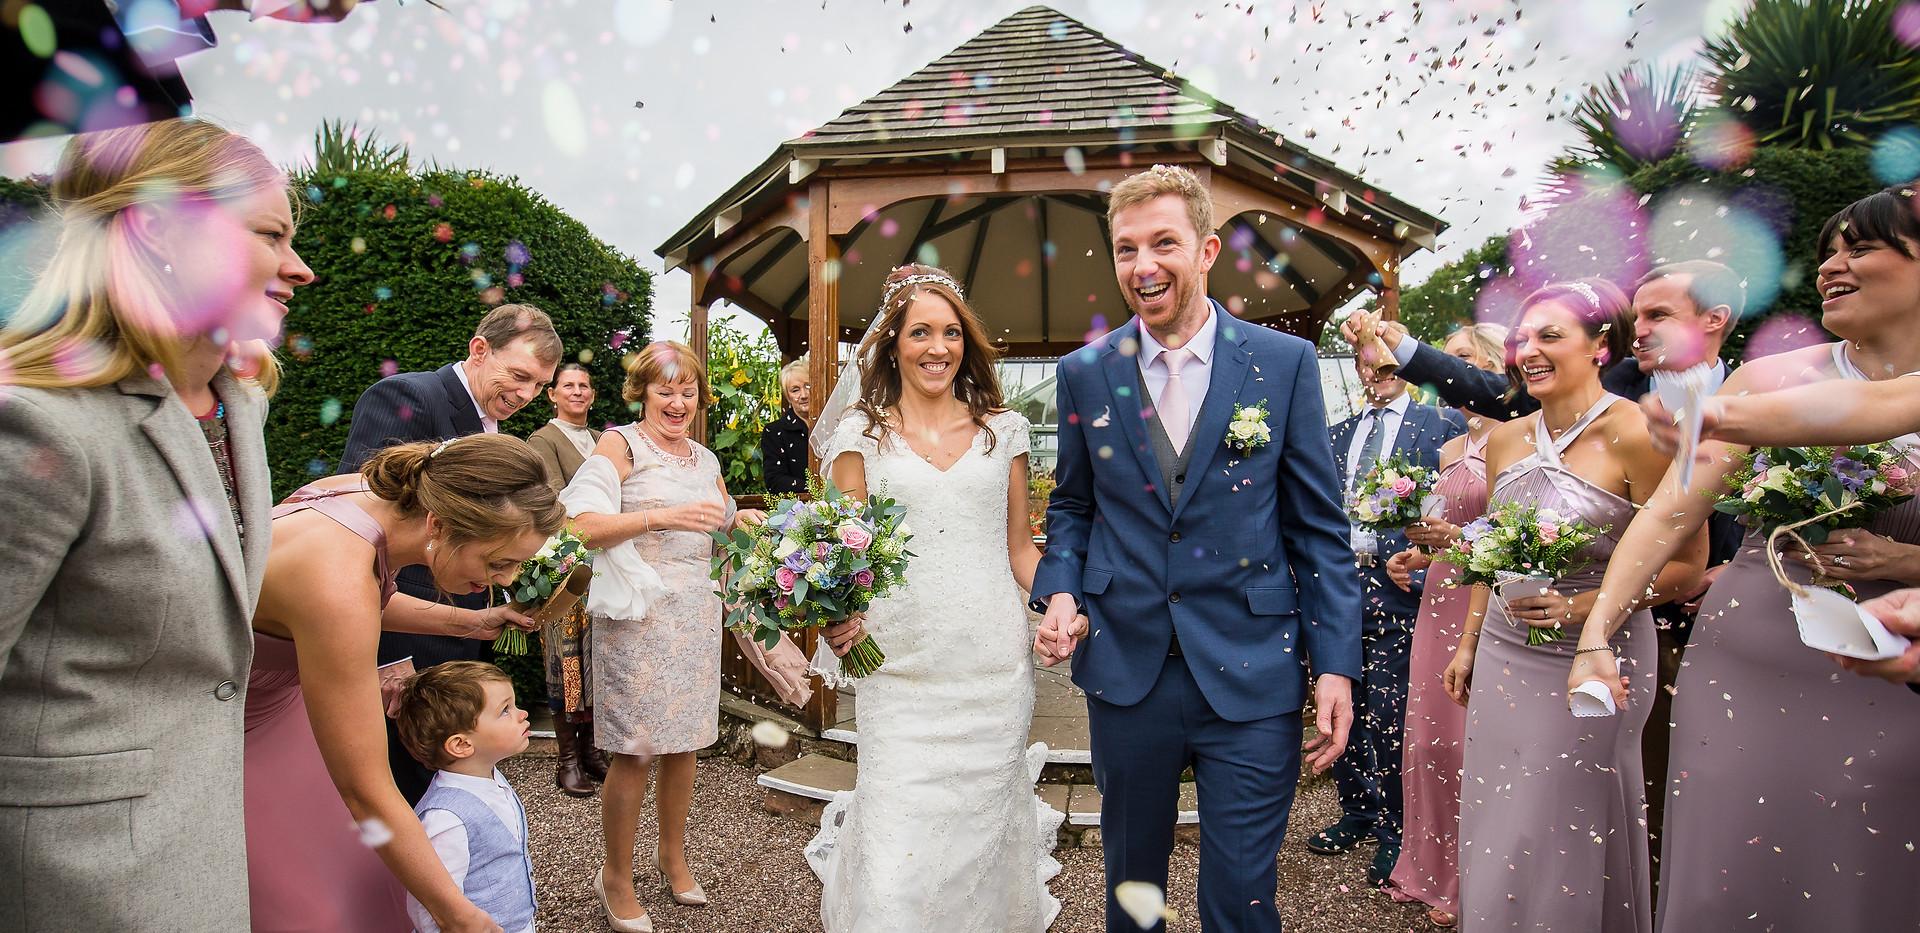 Abbeywood Wedding Photographer_5.jpg